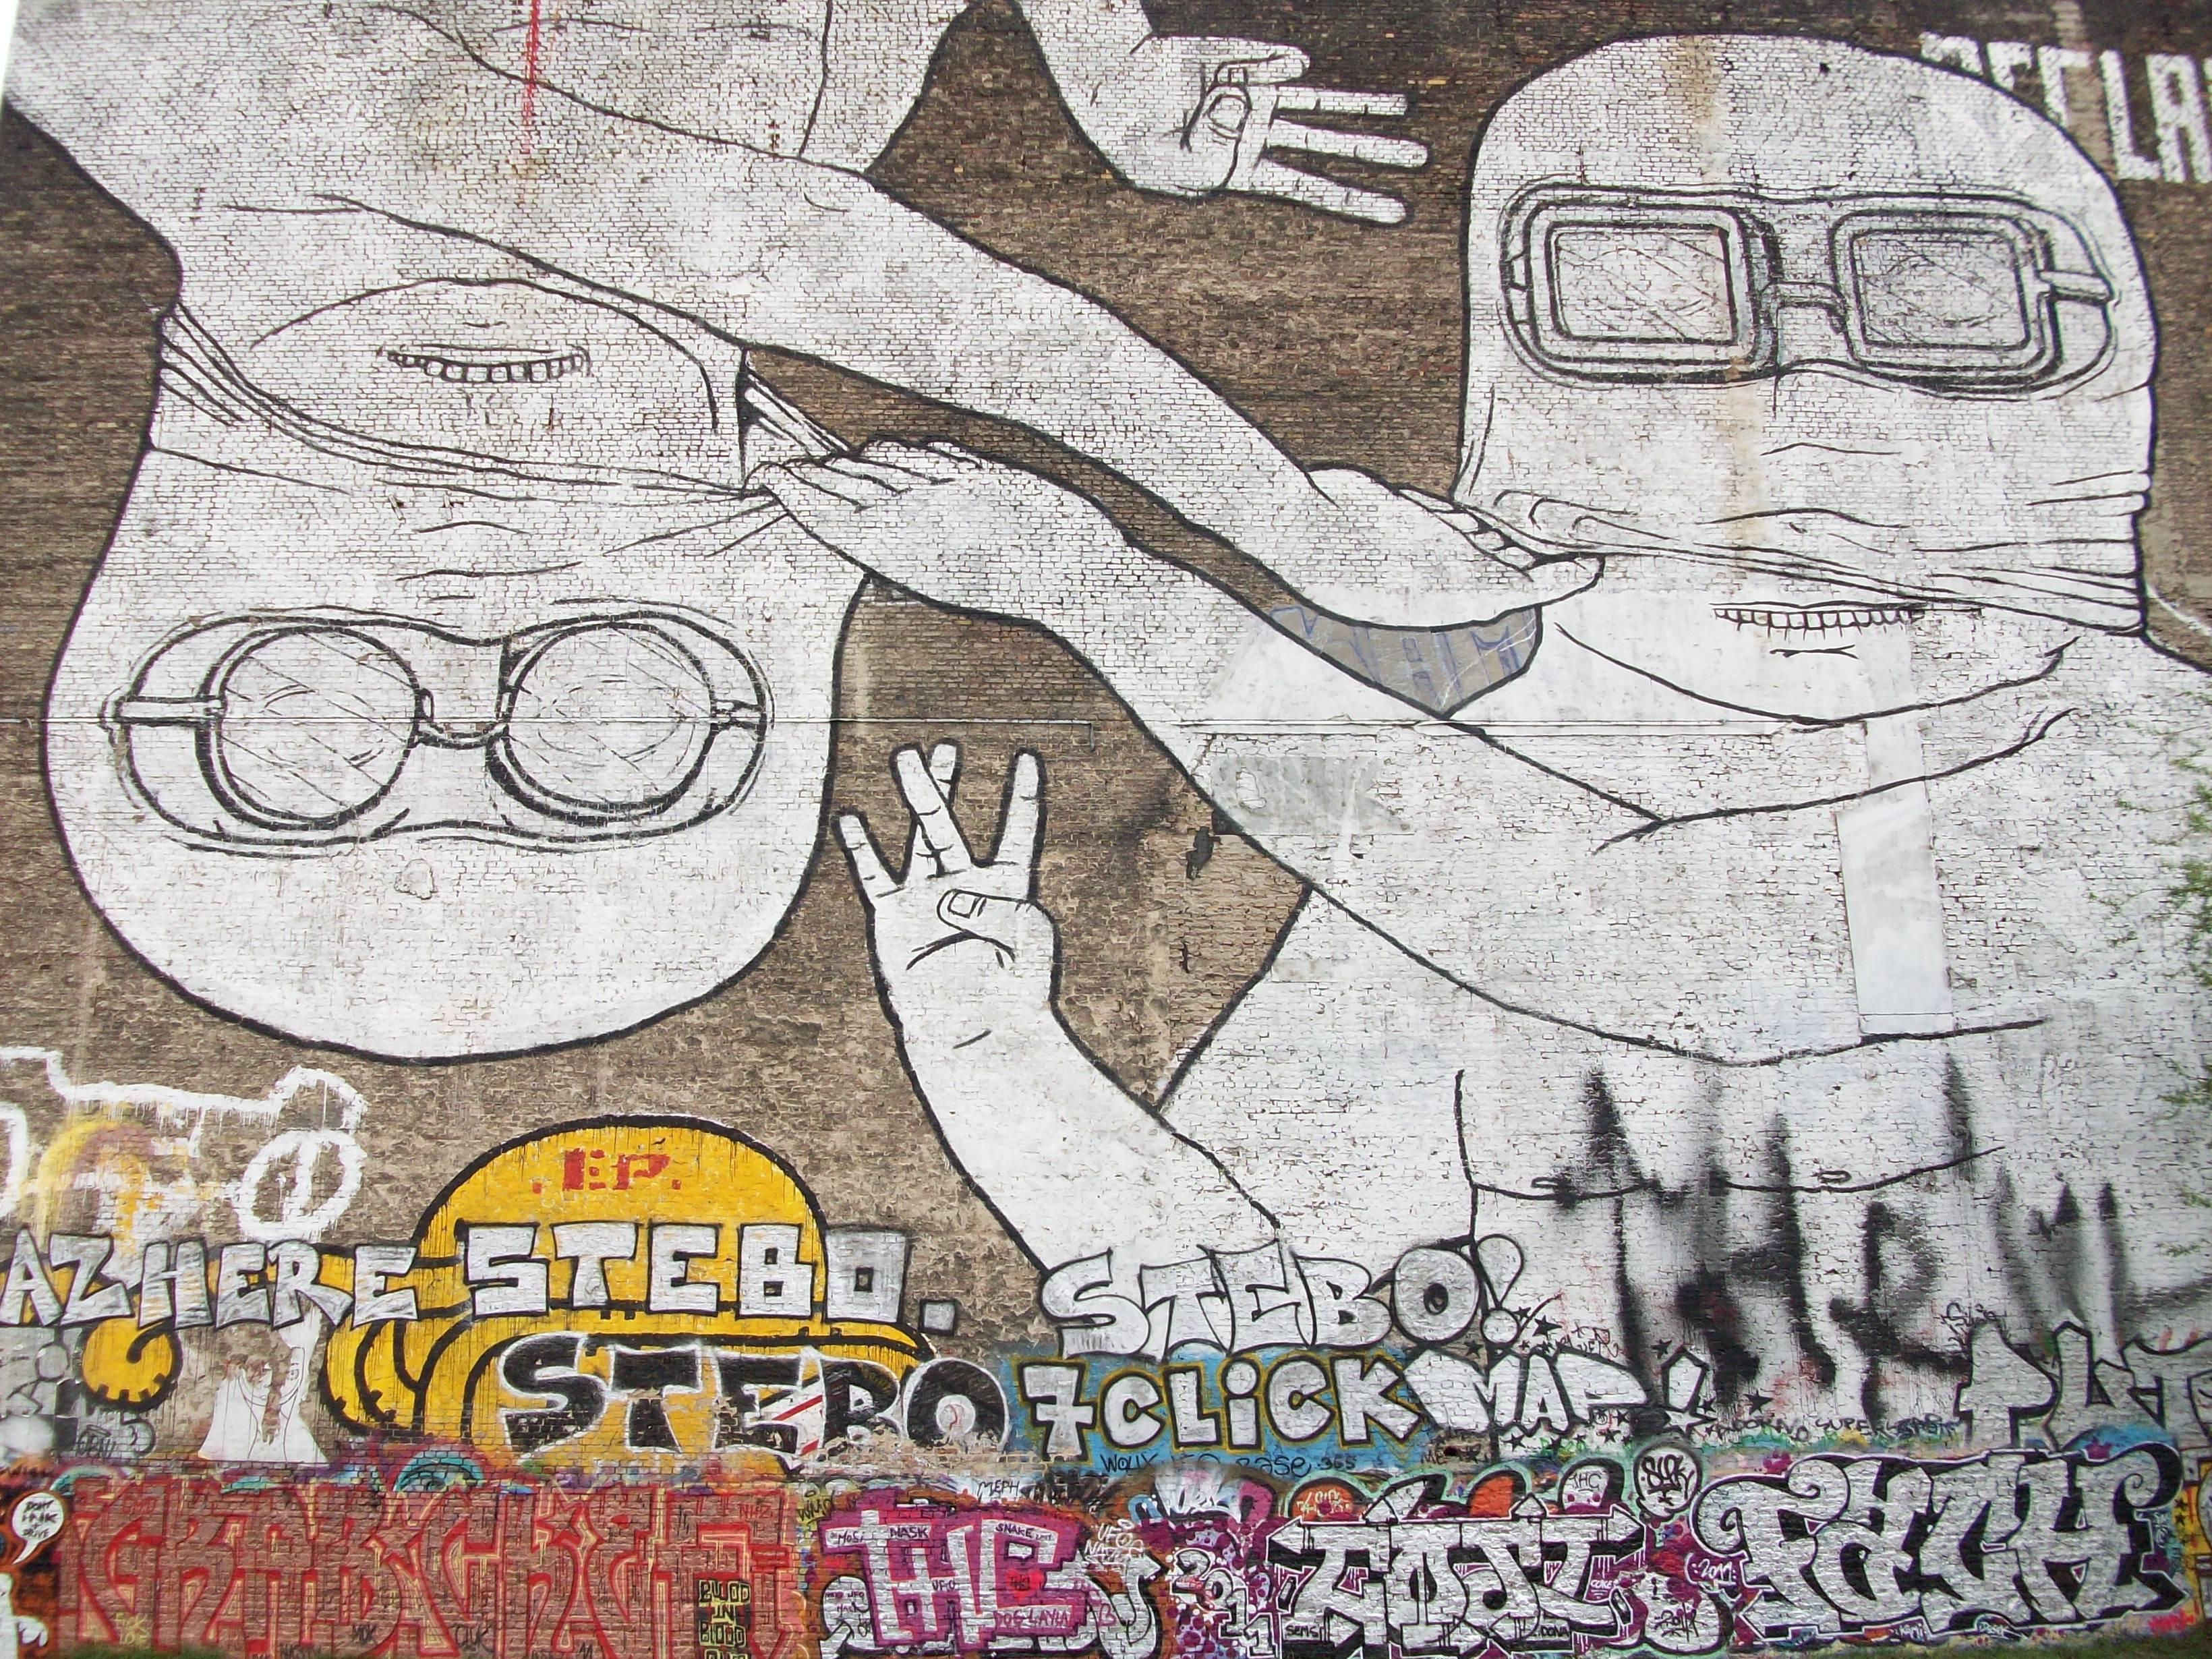 blu-grafite-italia-arte-urbana-donisio-arte (13)